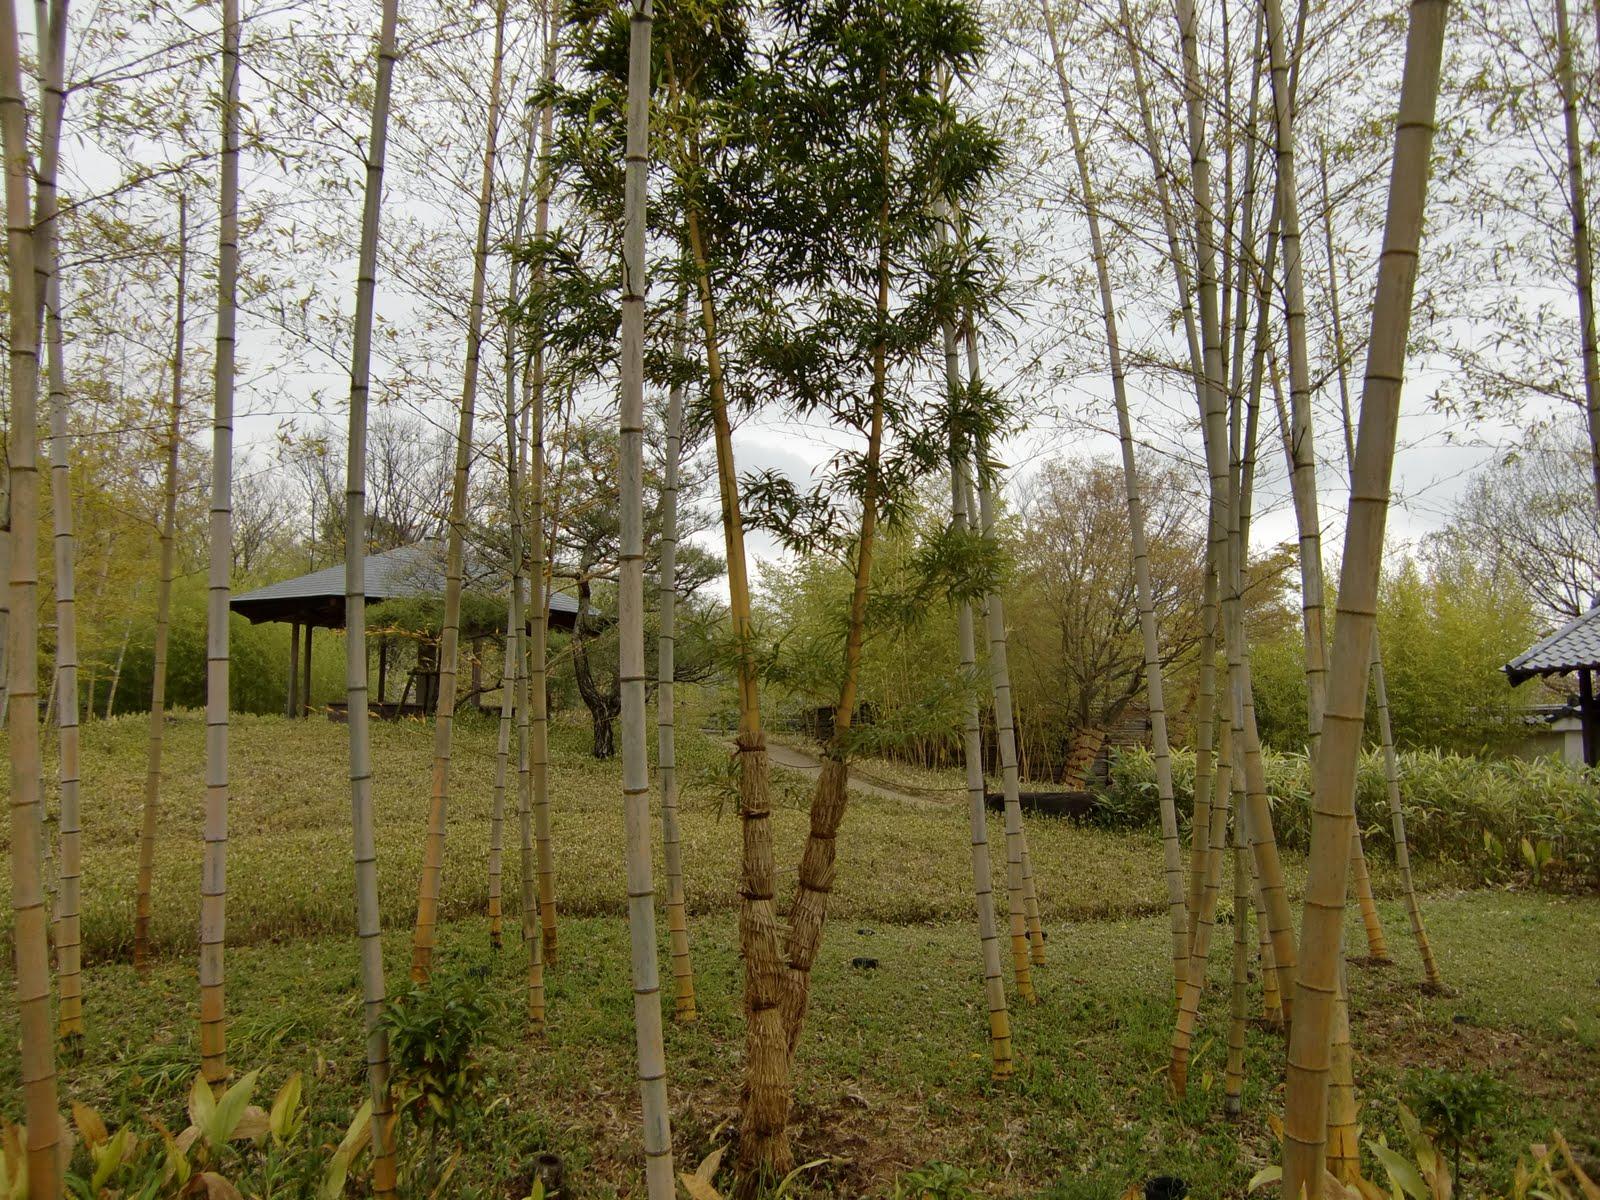 plantas jardim japones:bambu take kaizuka cyca buxinho podocarpo umê ameixeira japonesa